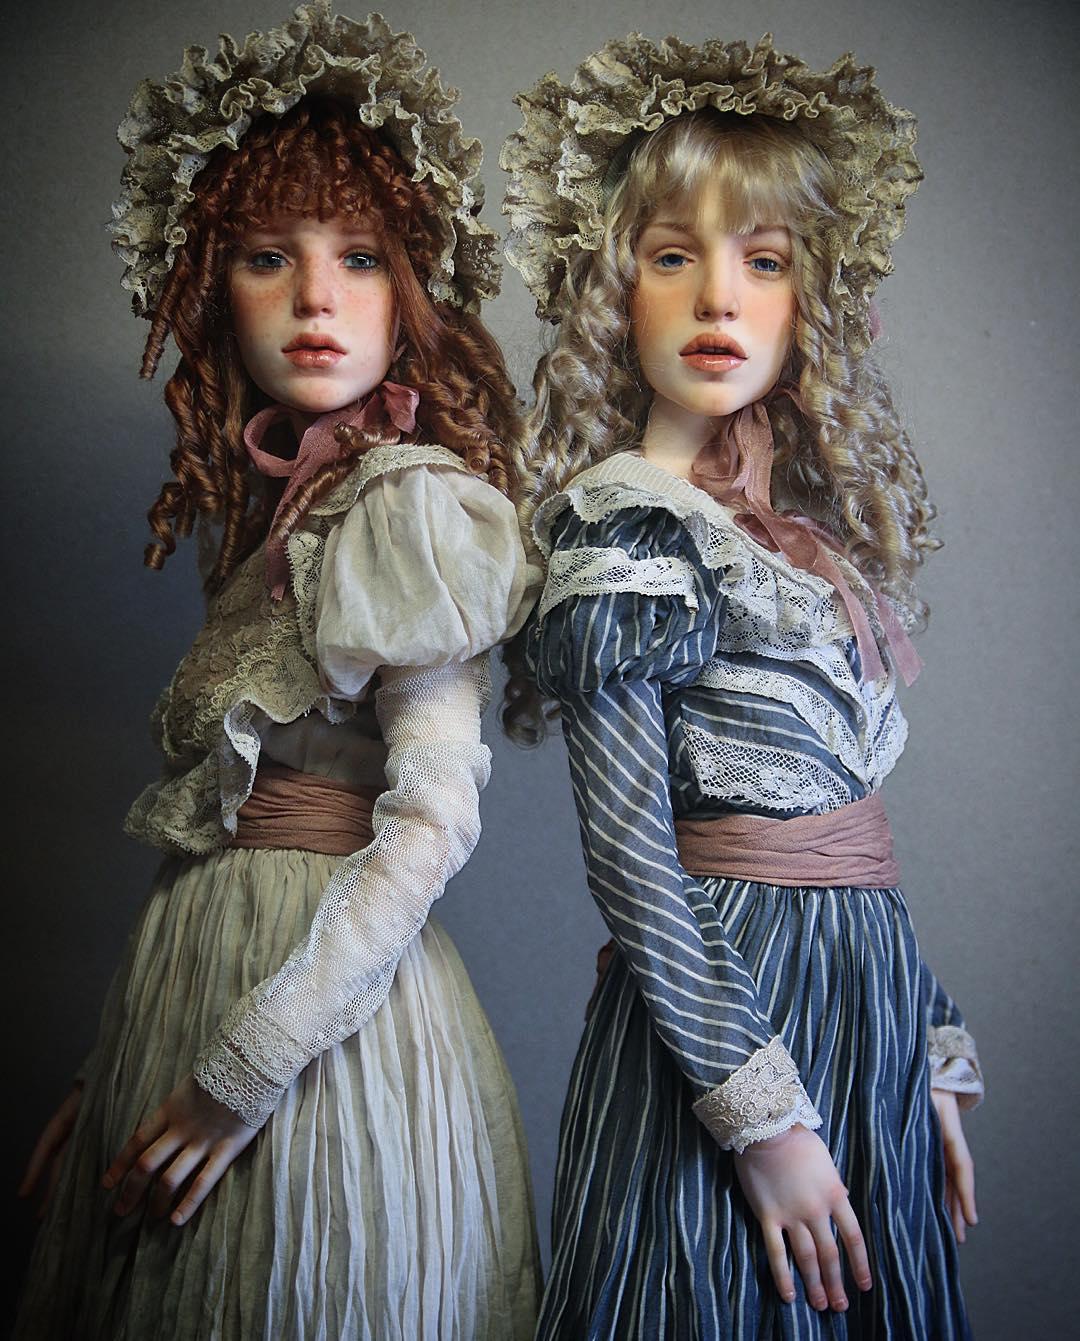 rostos-de-bonecas-realistas-6